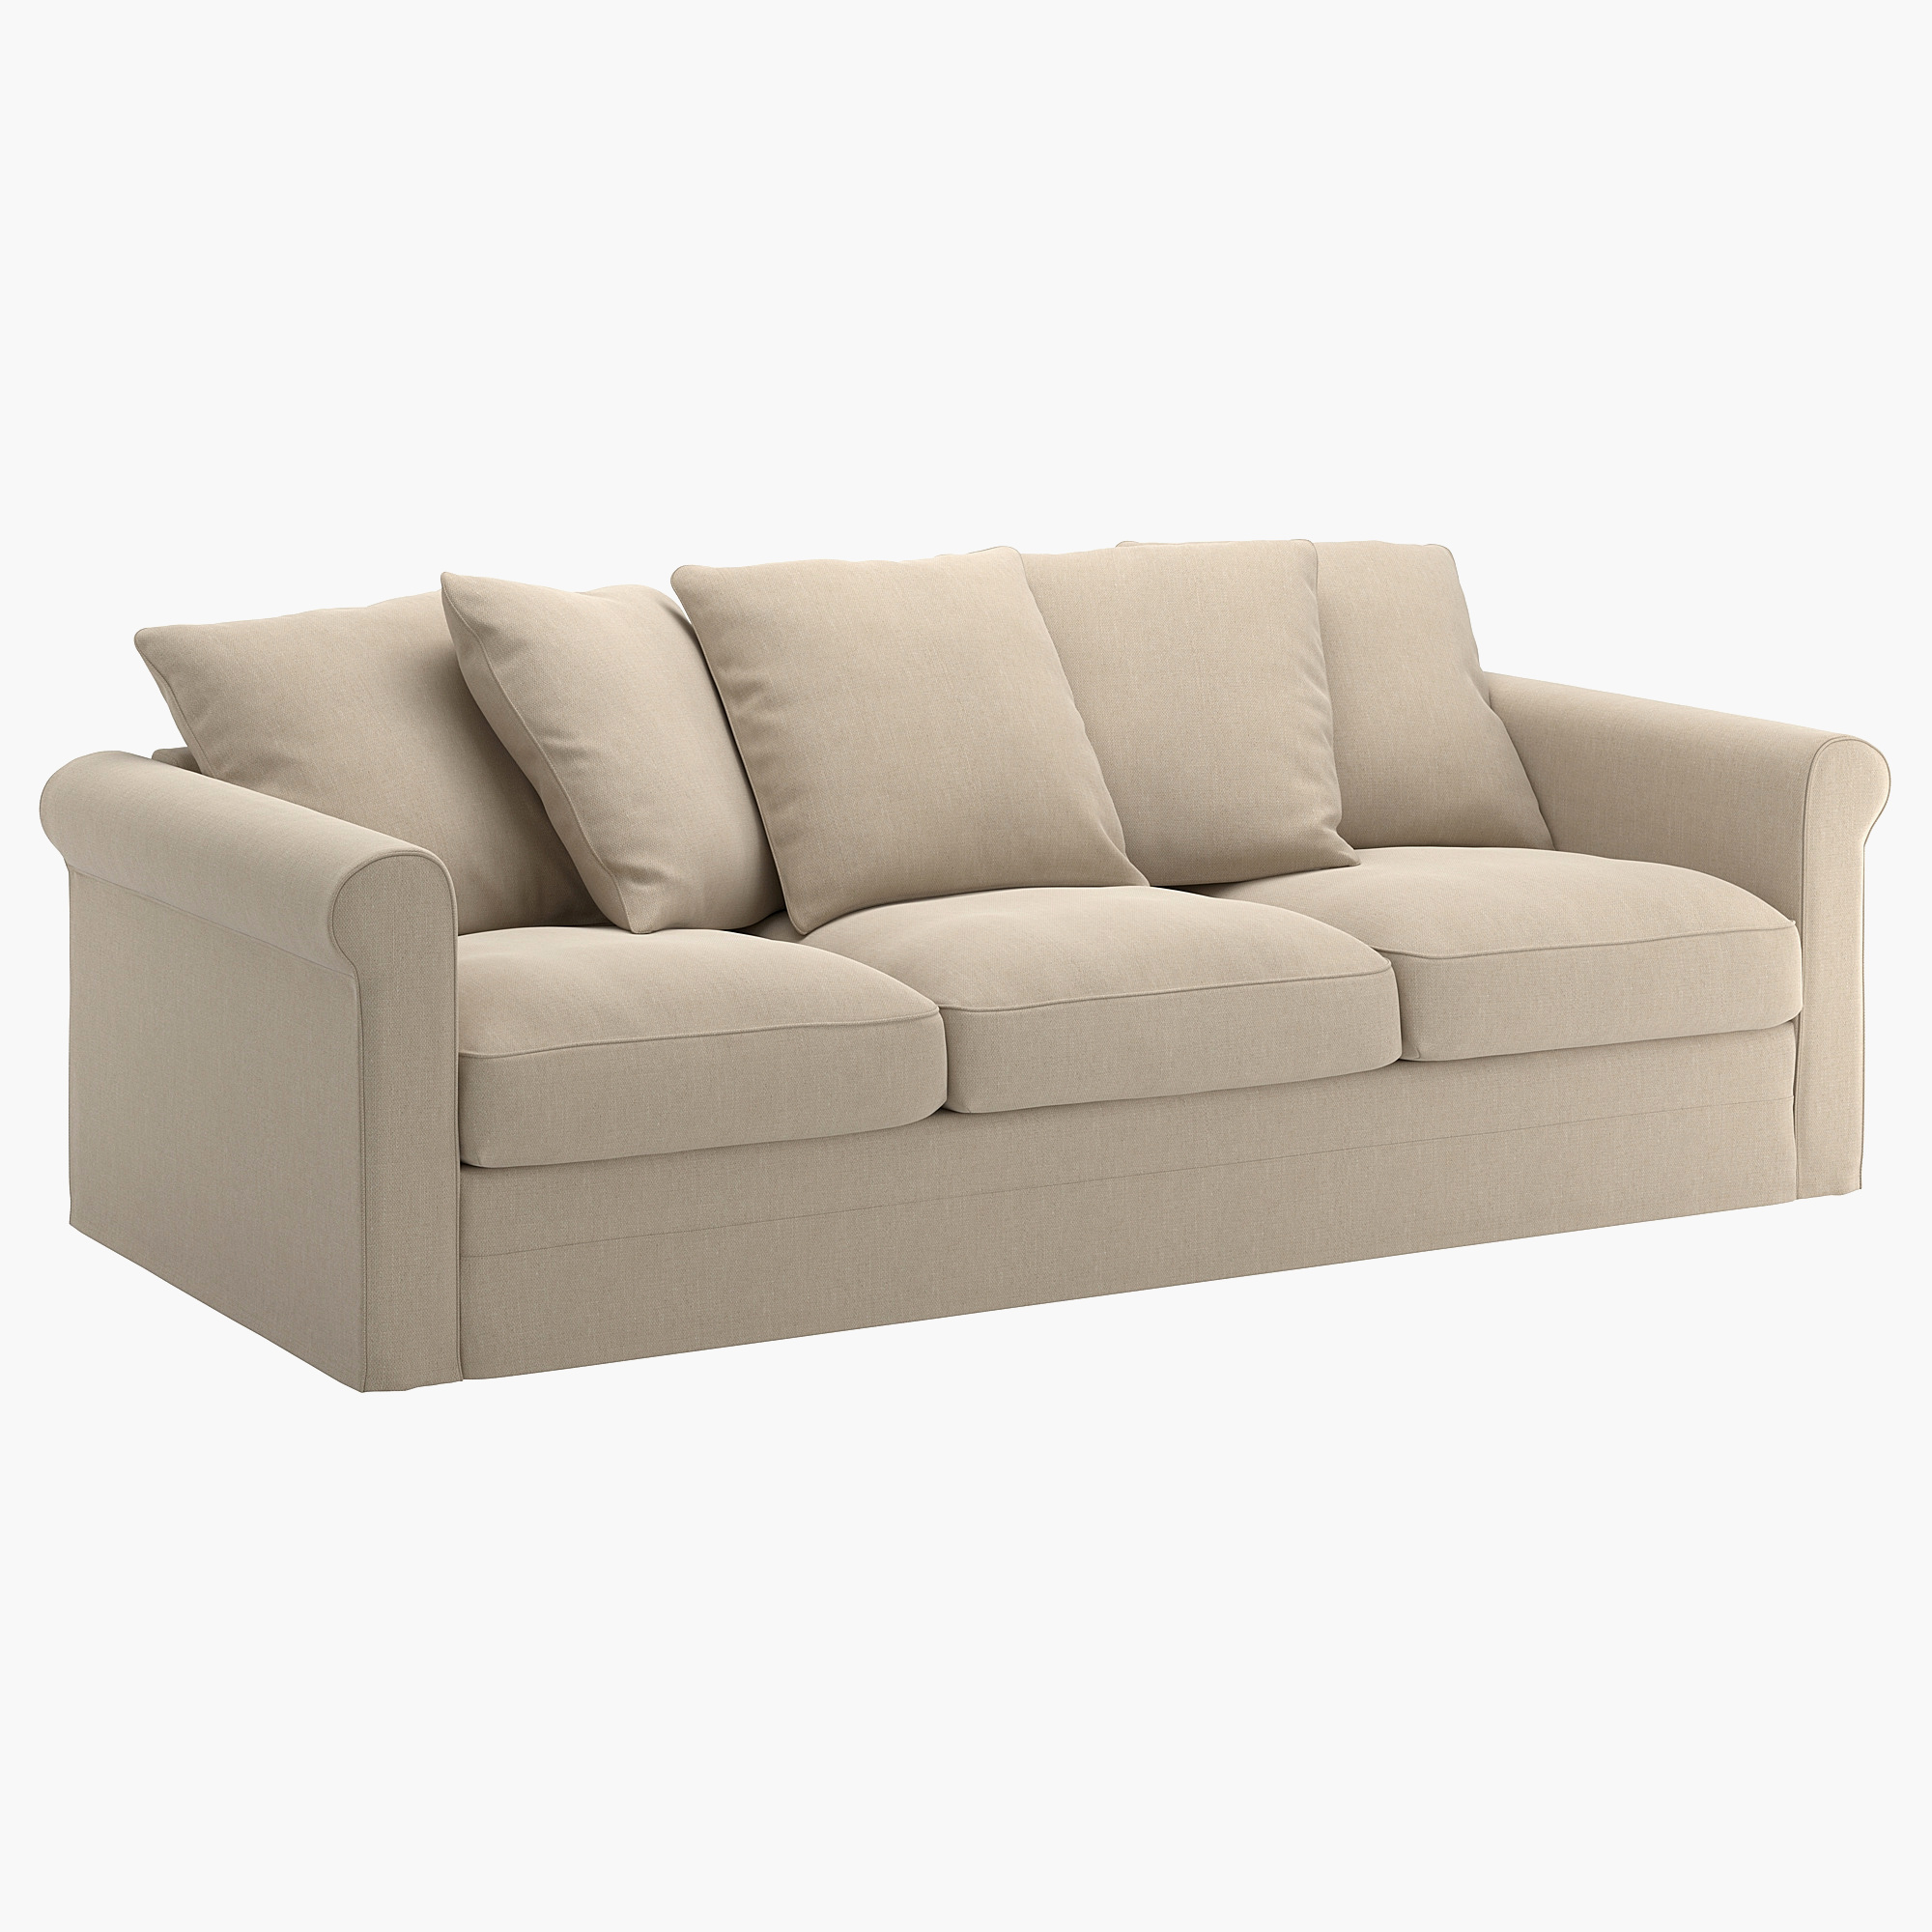 Telas Para Cubrir sofas Ikea 3id6 Telas Para Cubrir sofas Ikea Tienda Online De Fundas De sofÃ